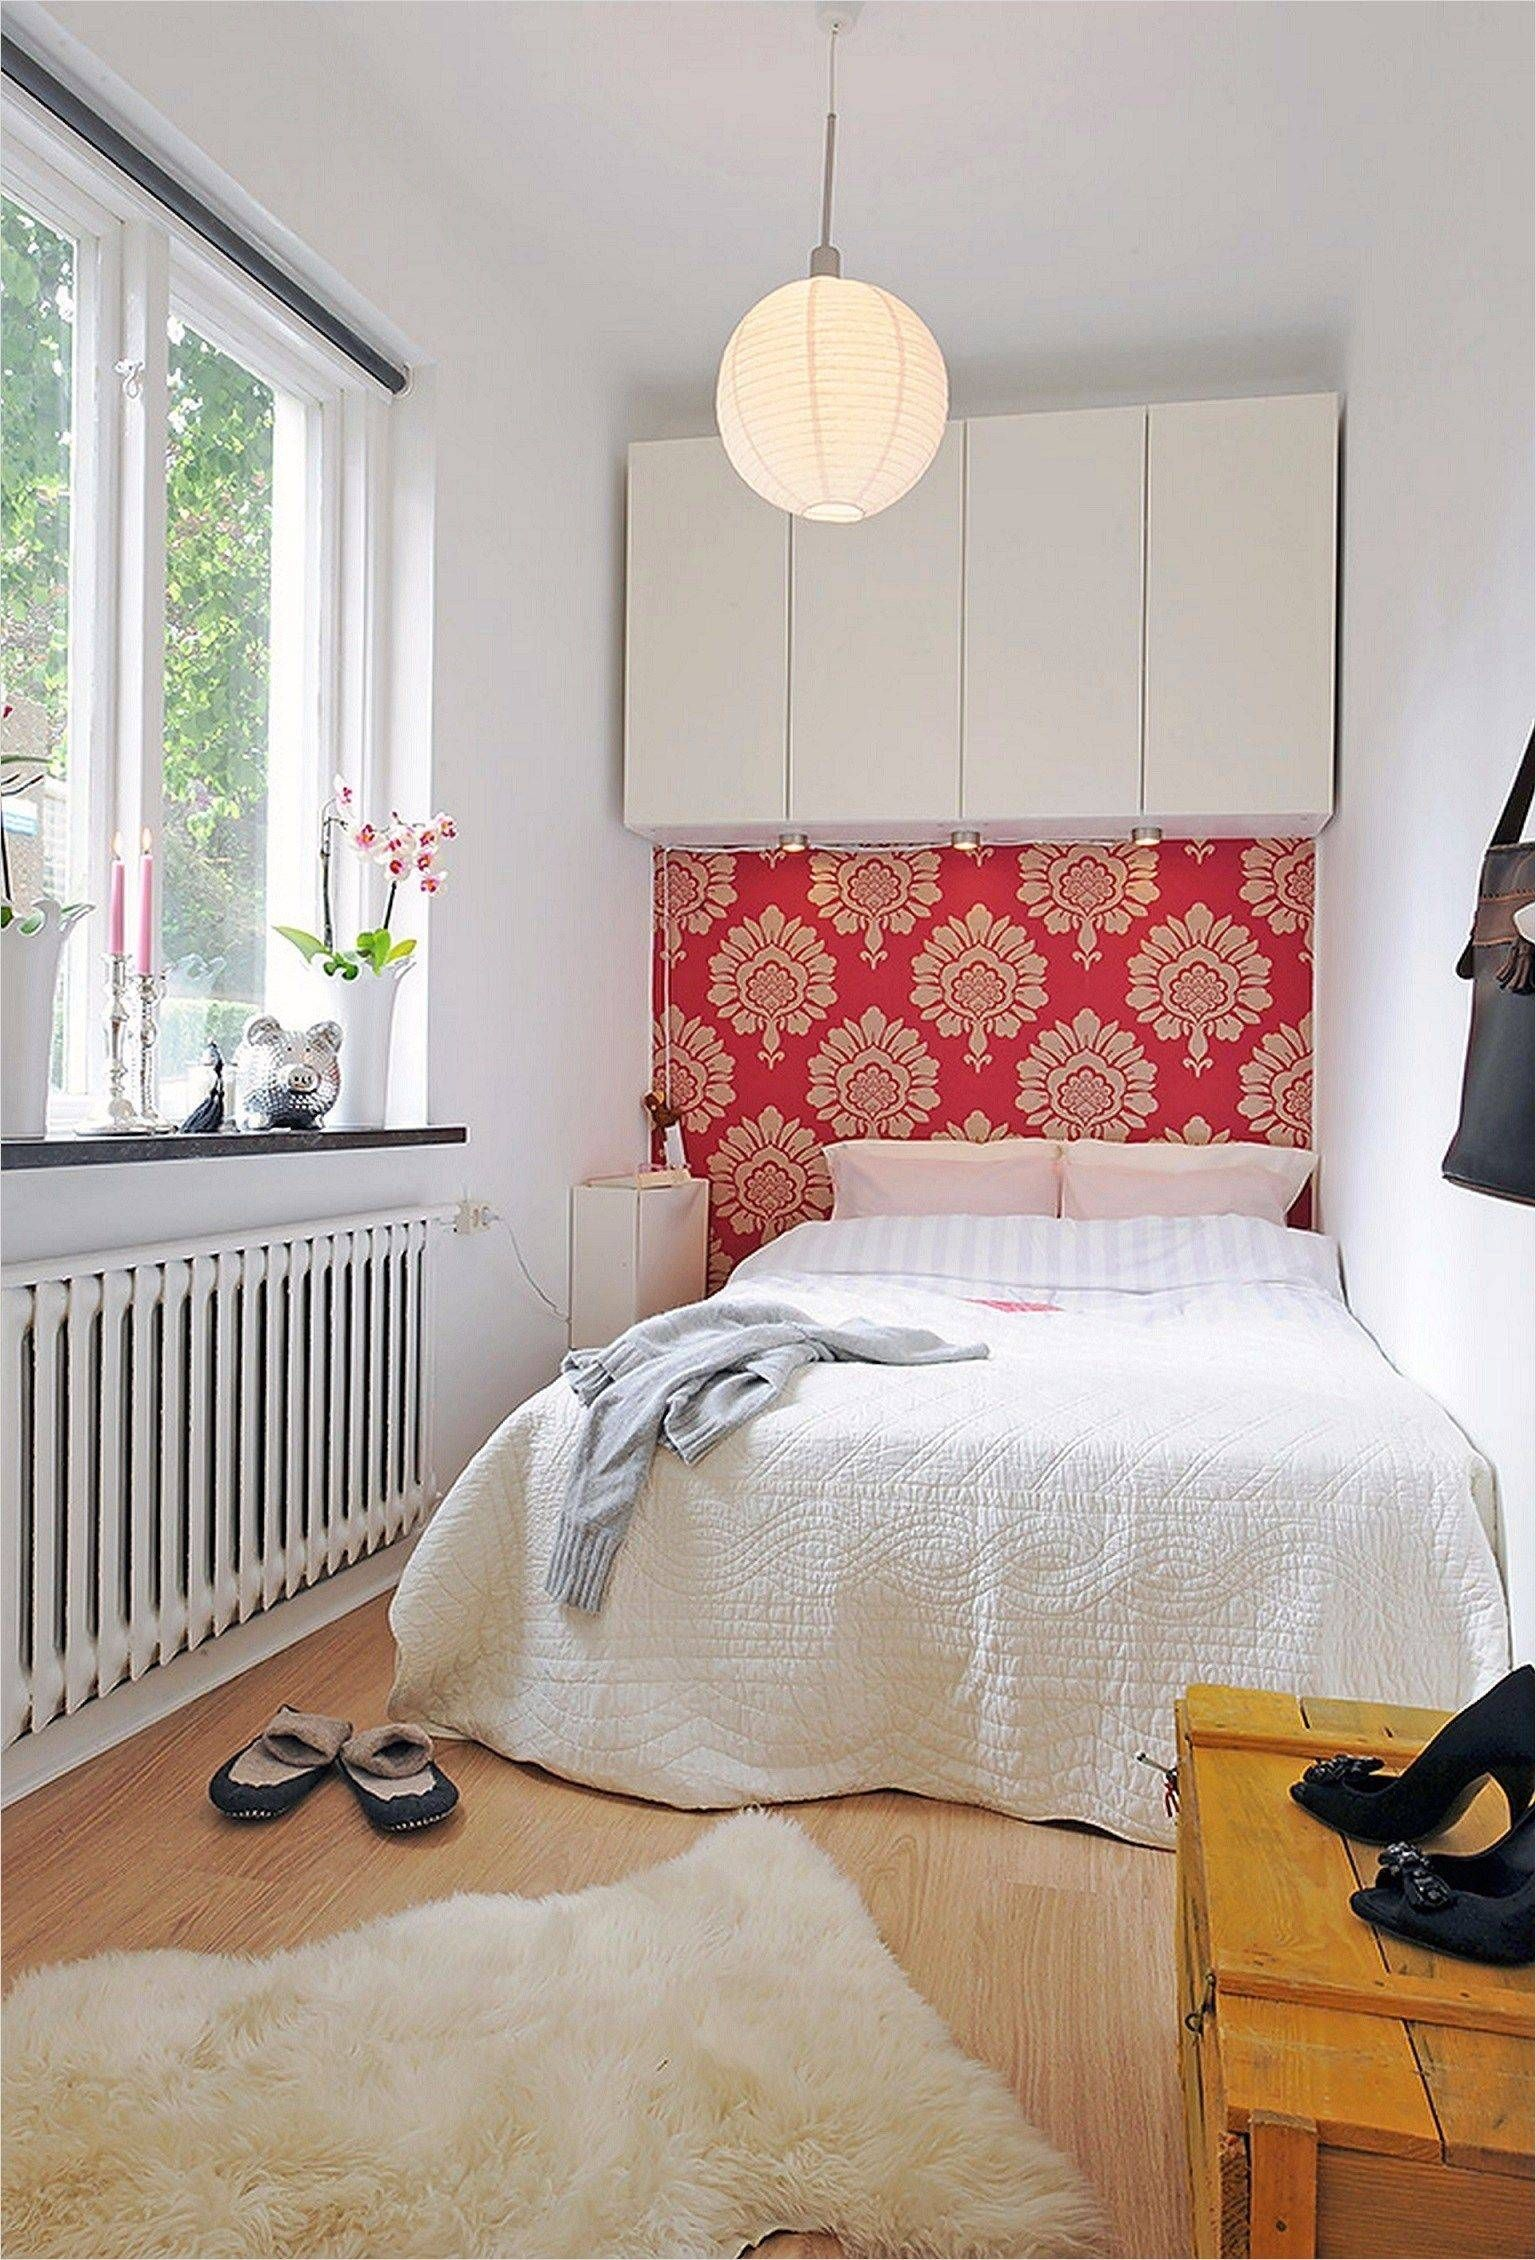 Modern Small Bedrooms Designs , #homedecoration #homedecor #interiordesign #interior #home #homedesign #decor #homesweethome #decoration #design #handmade #interiors #interiordesigner #furniture #homestyle #dekorasirumah #livingroom #art #christmas #interiorstyling #luxury #architecture #homeinspiration #homeinterior